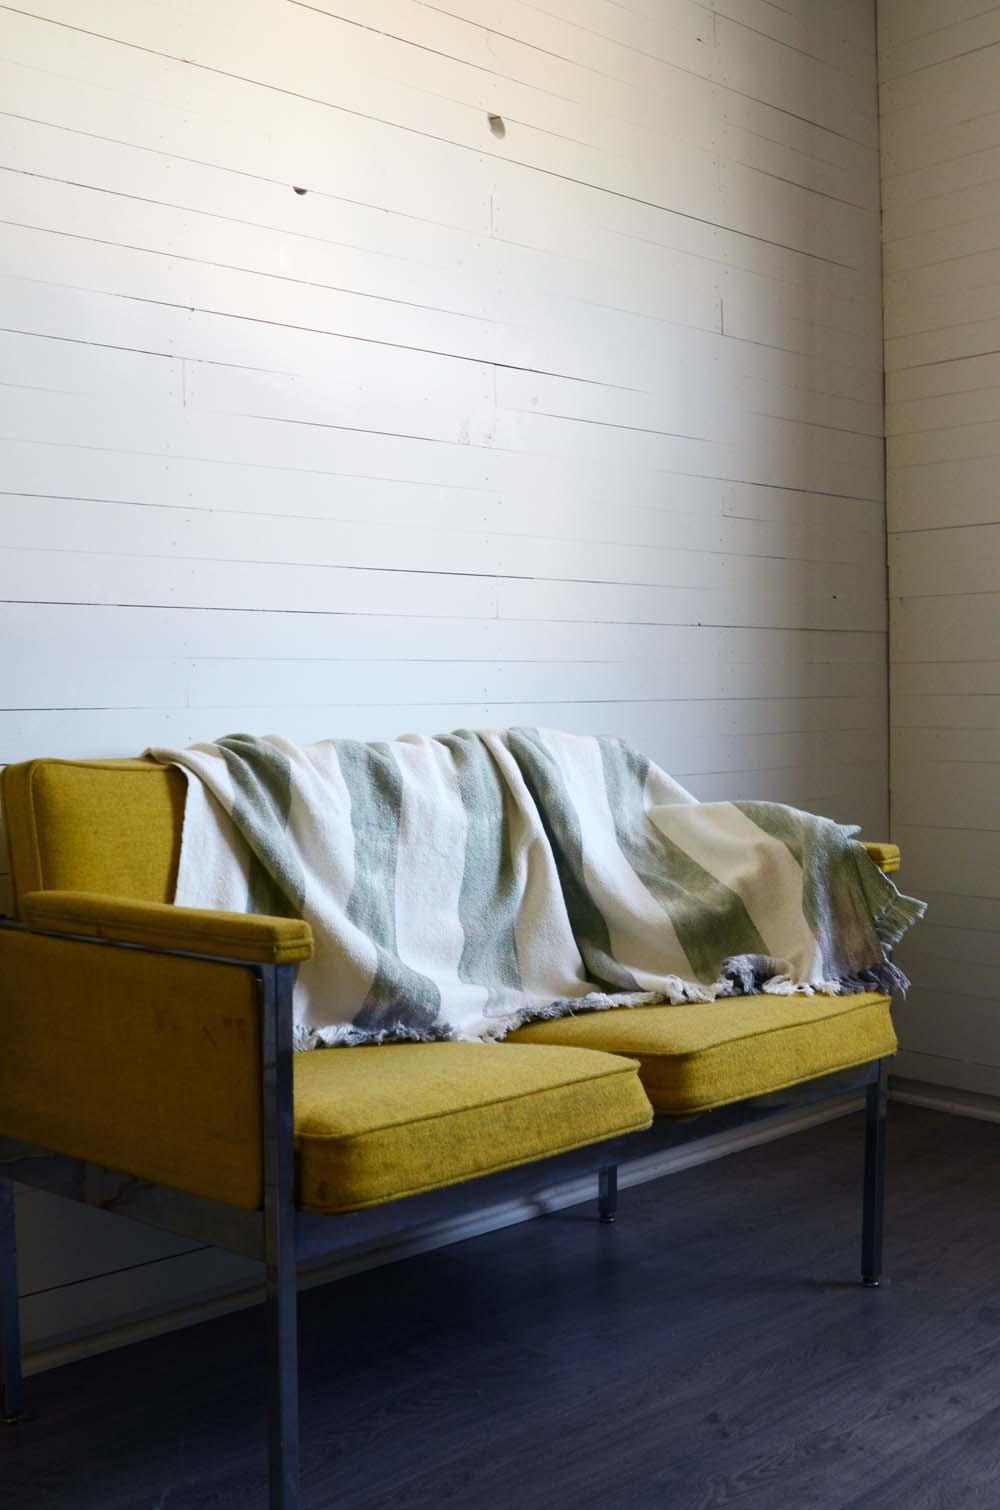 Blankets-5.jpg